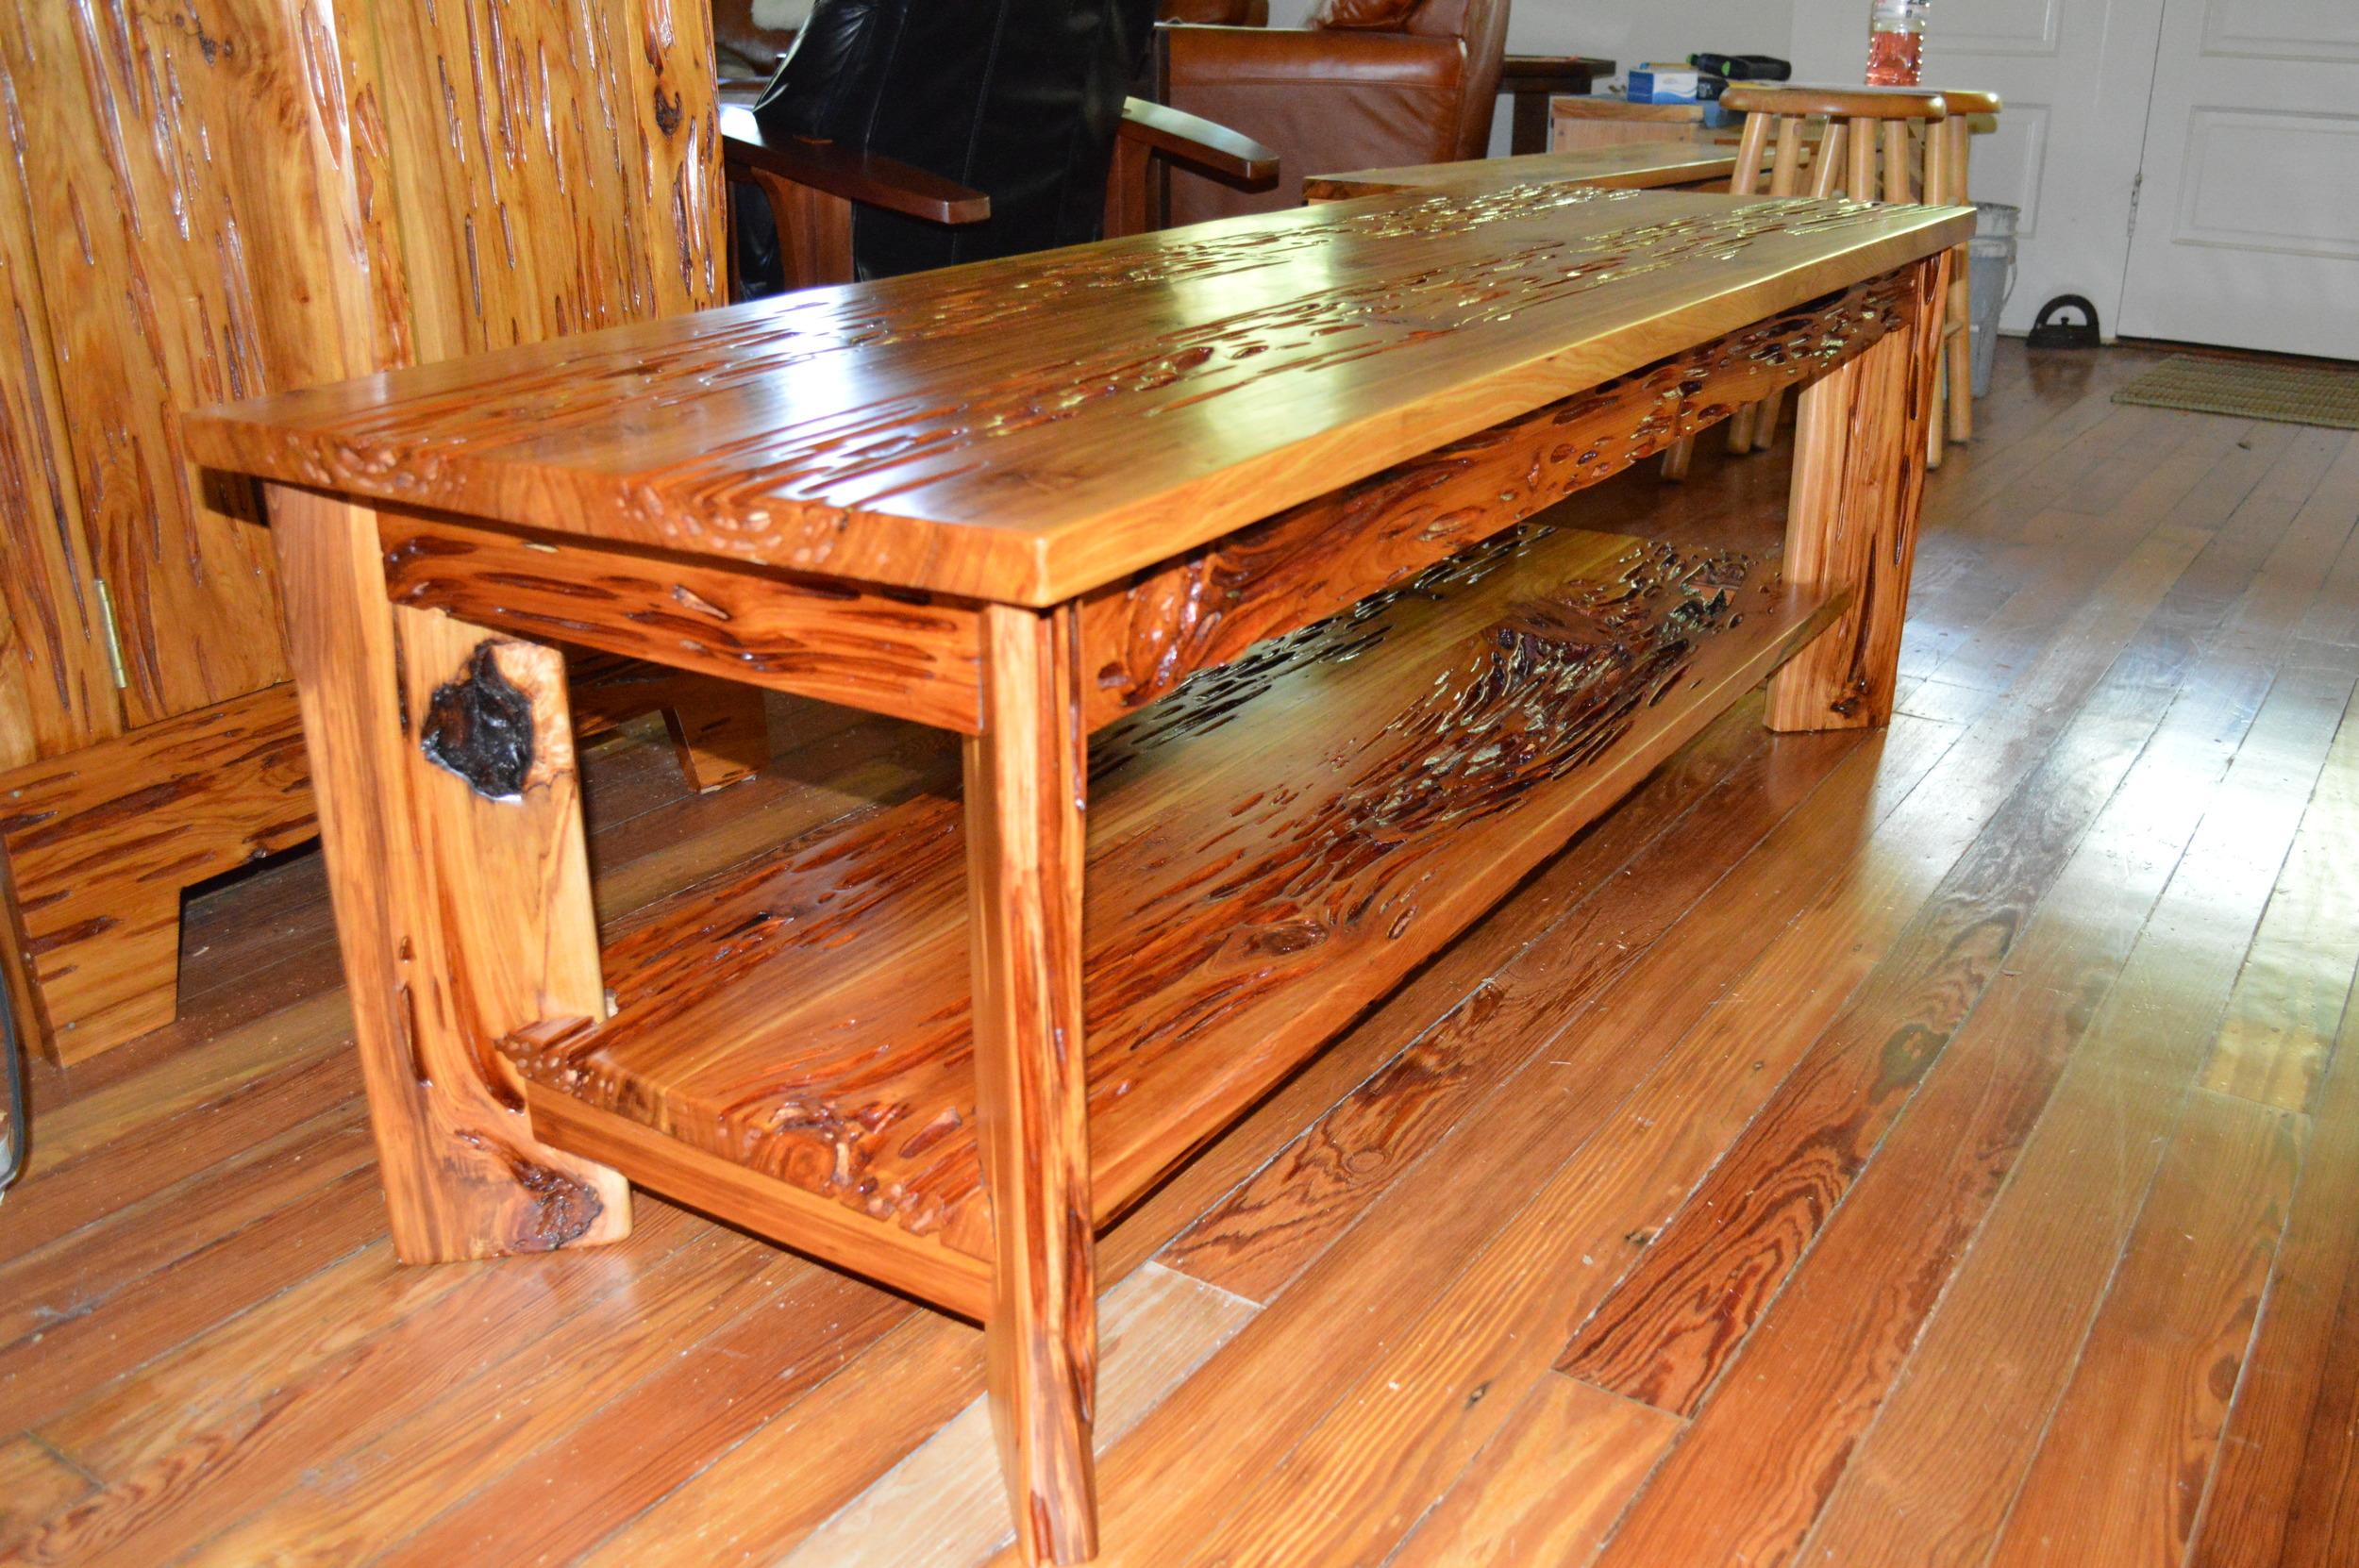 Sinker Cypress Coffee Tables Don Hostetler S Fine Cypress Furniture